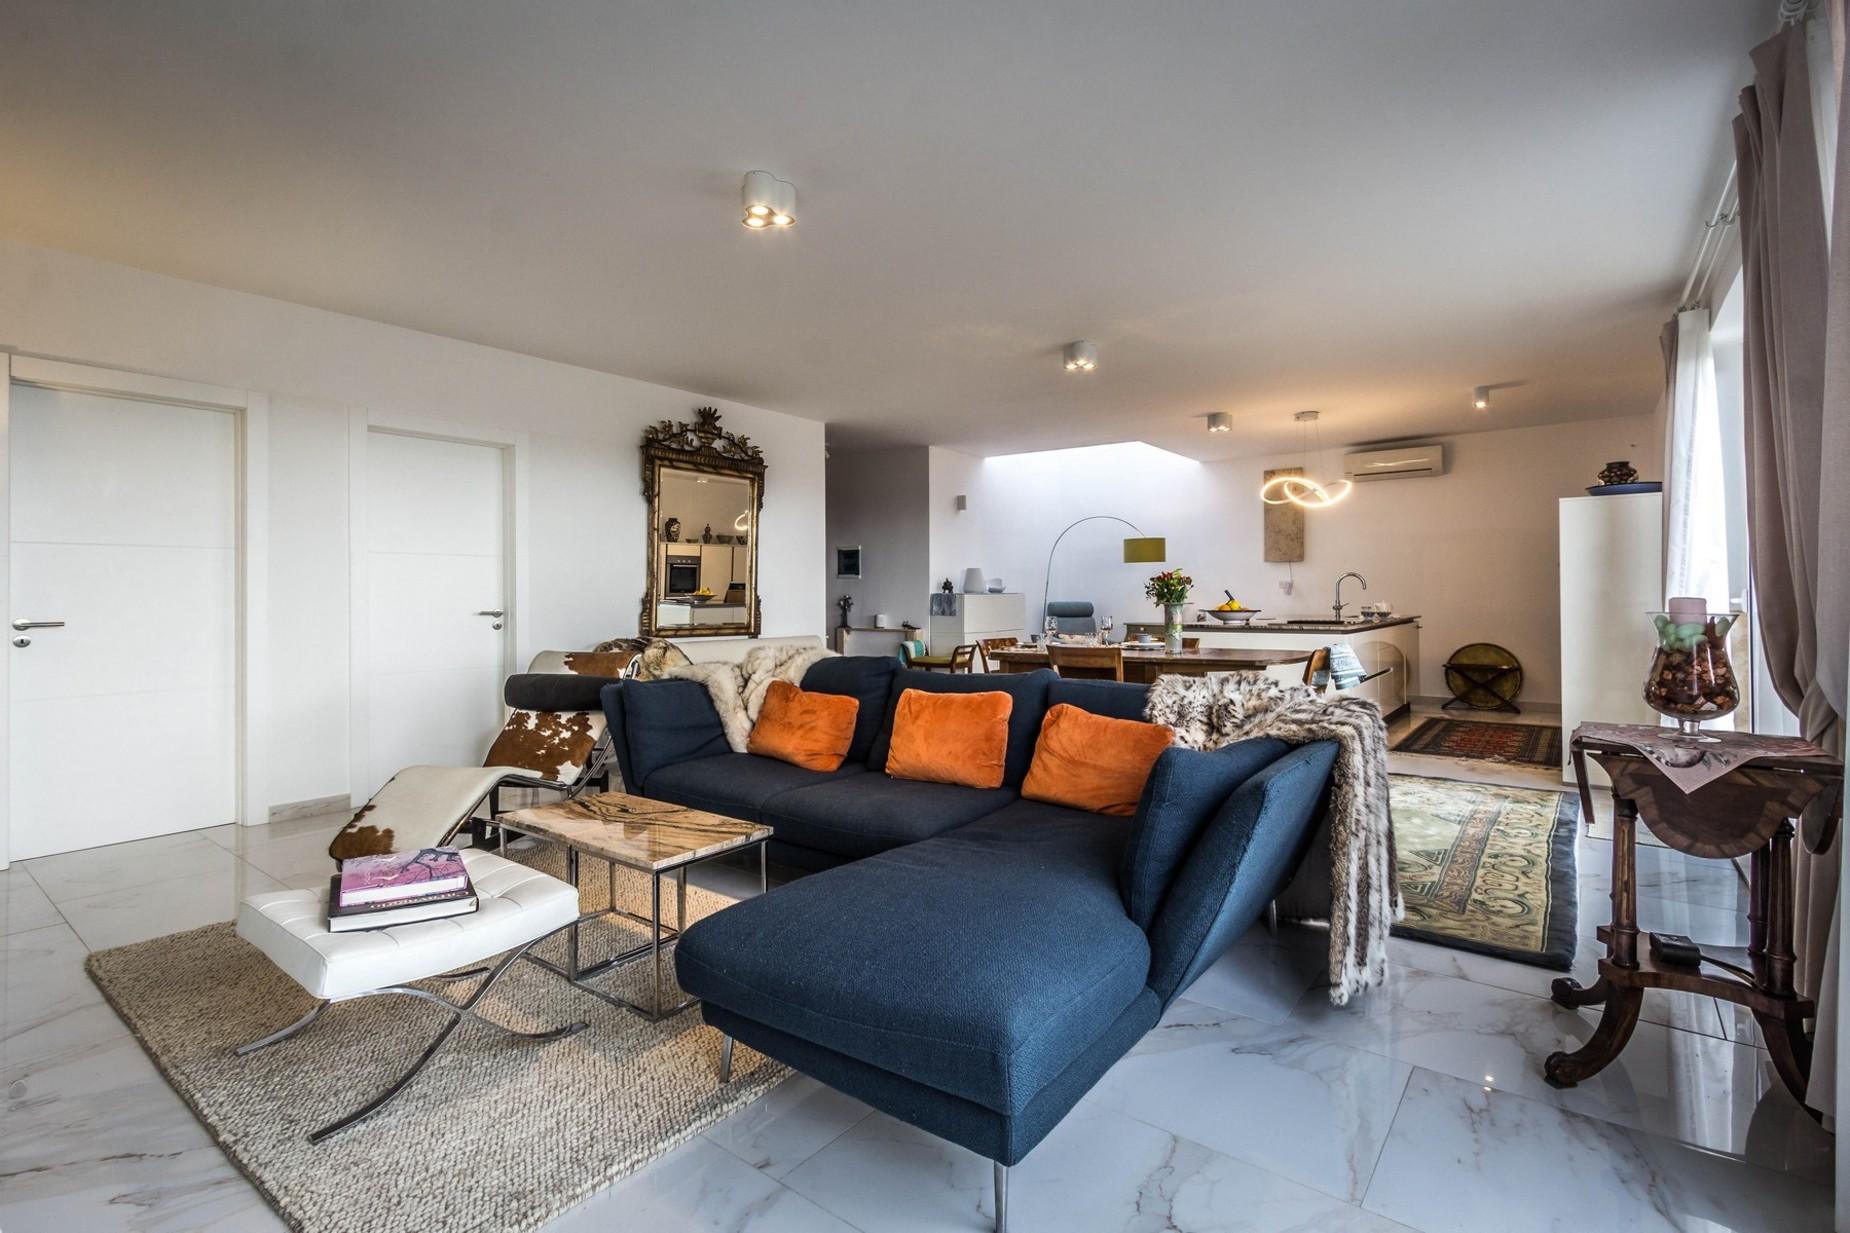 2 bed Penthouse For Sale in Pieta, Pieta - thumb 16